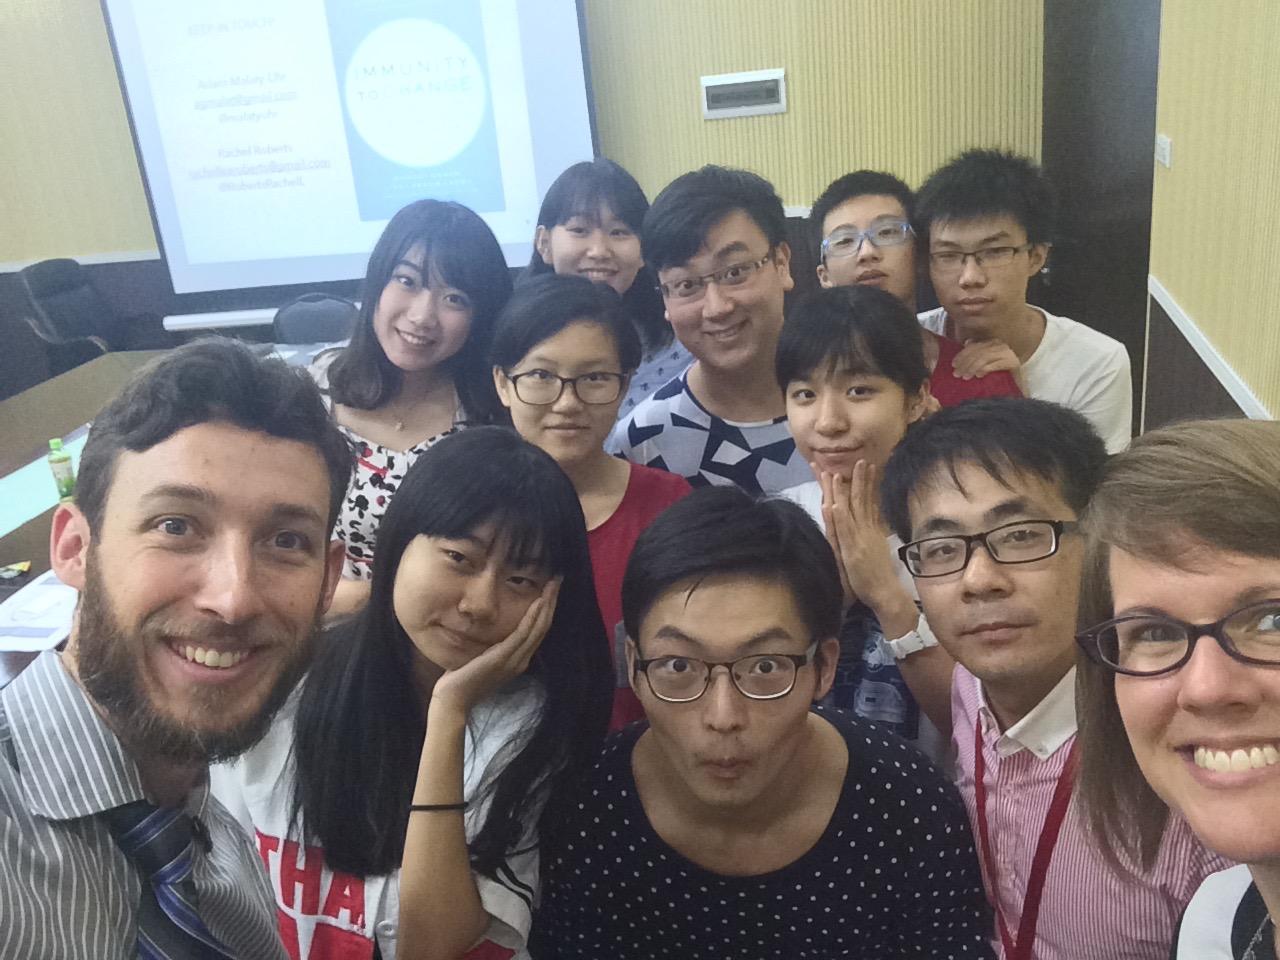 Guangzhou, China - session 2, immunity to change class